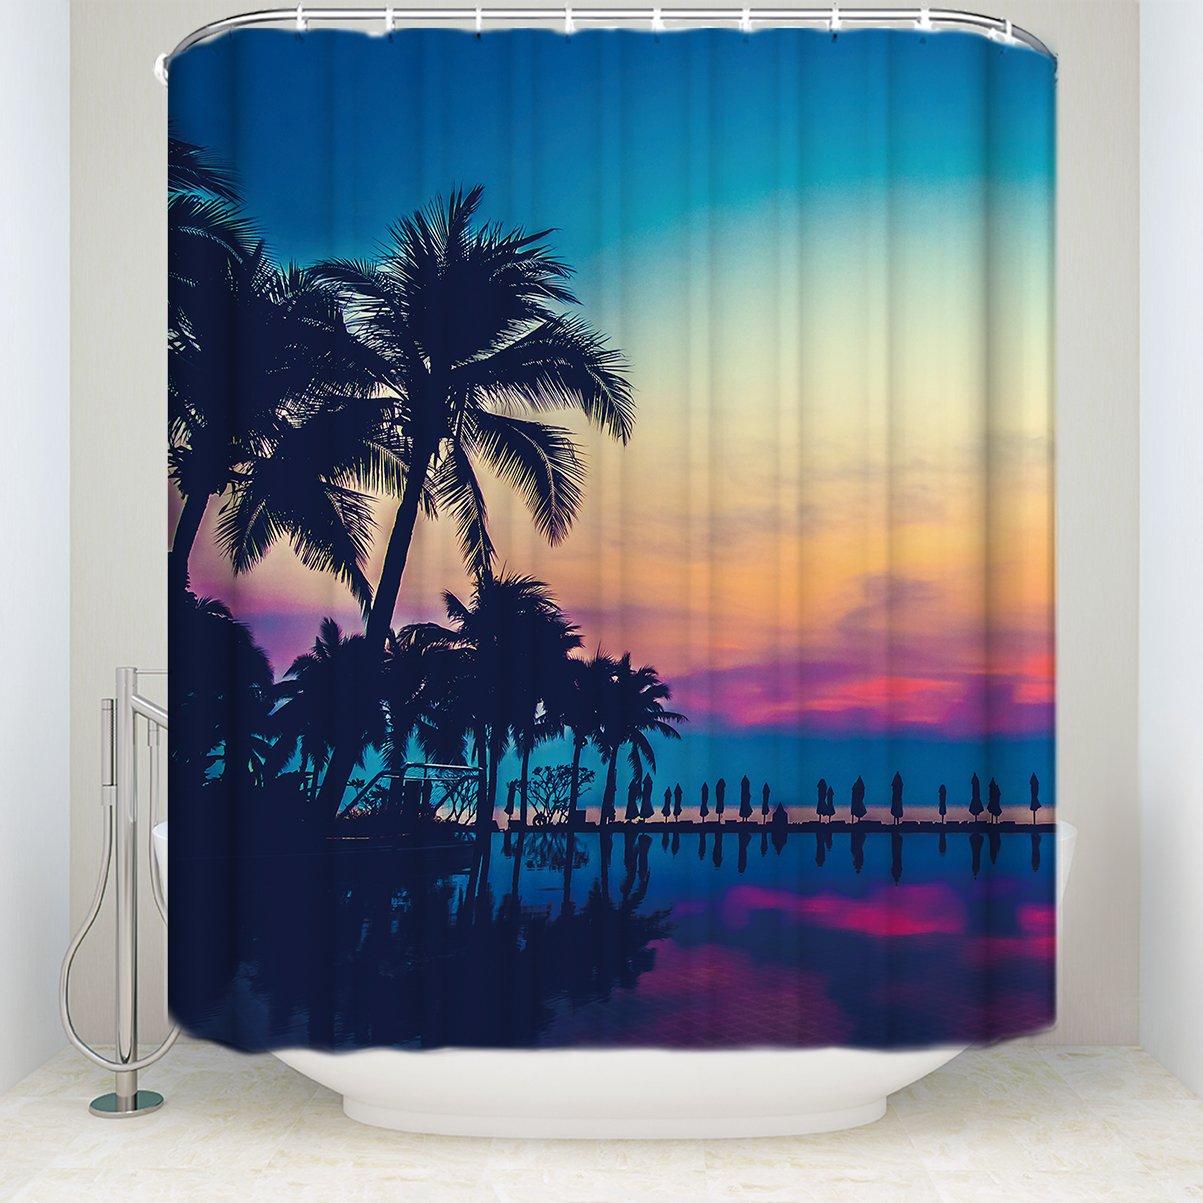 Beauty Decor Tropical Beach Palm Trees Seawater Blue Waterproof Polyester Fabric Shower Curtain Bathroom Decor